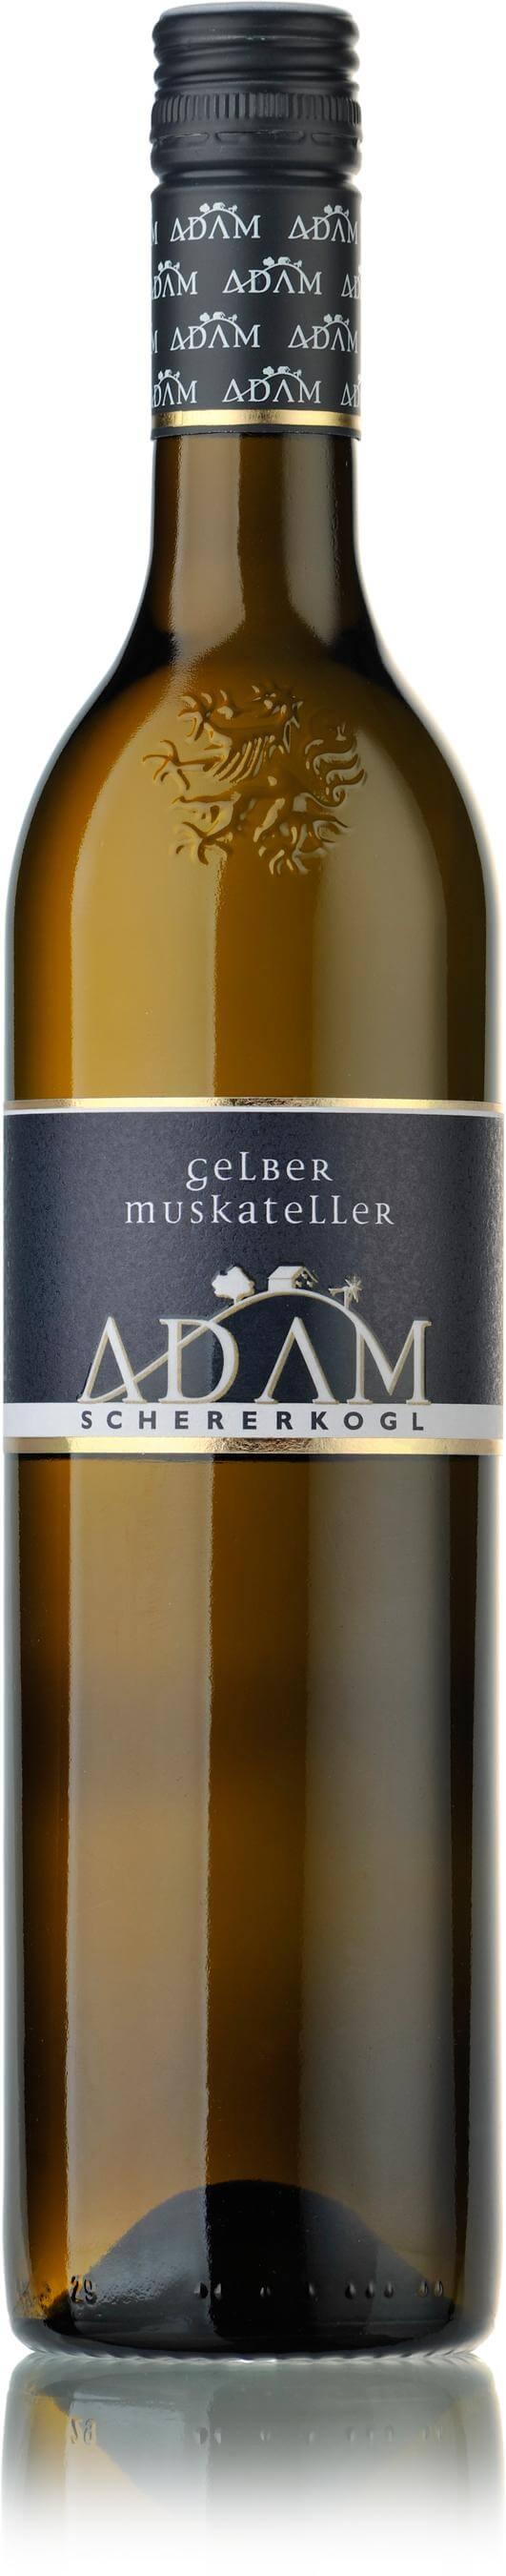 Gelber Muskateller Südsteiermark DAC 2020 / Adam-Schererkogl